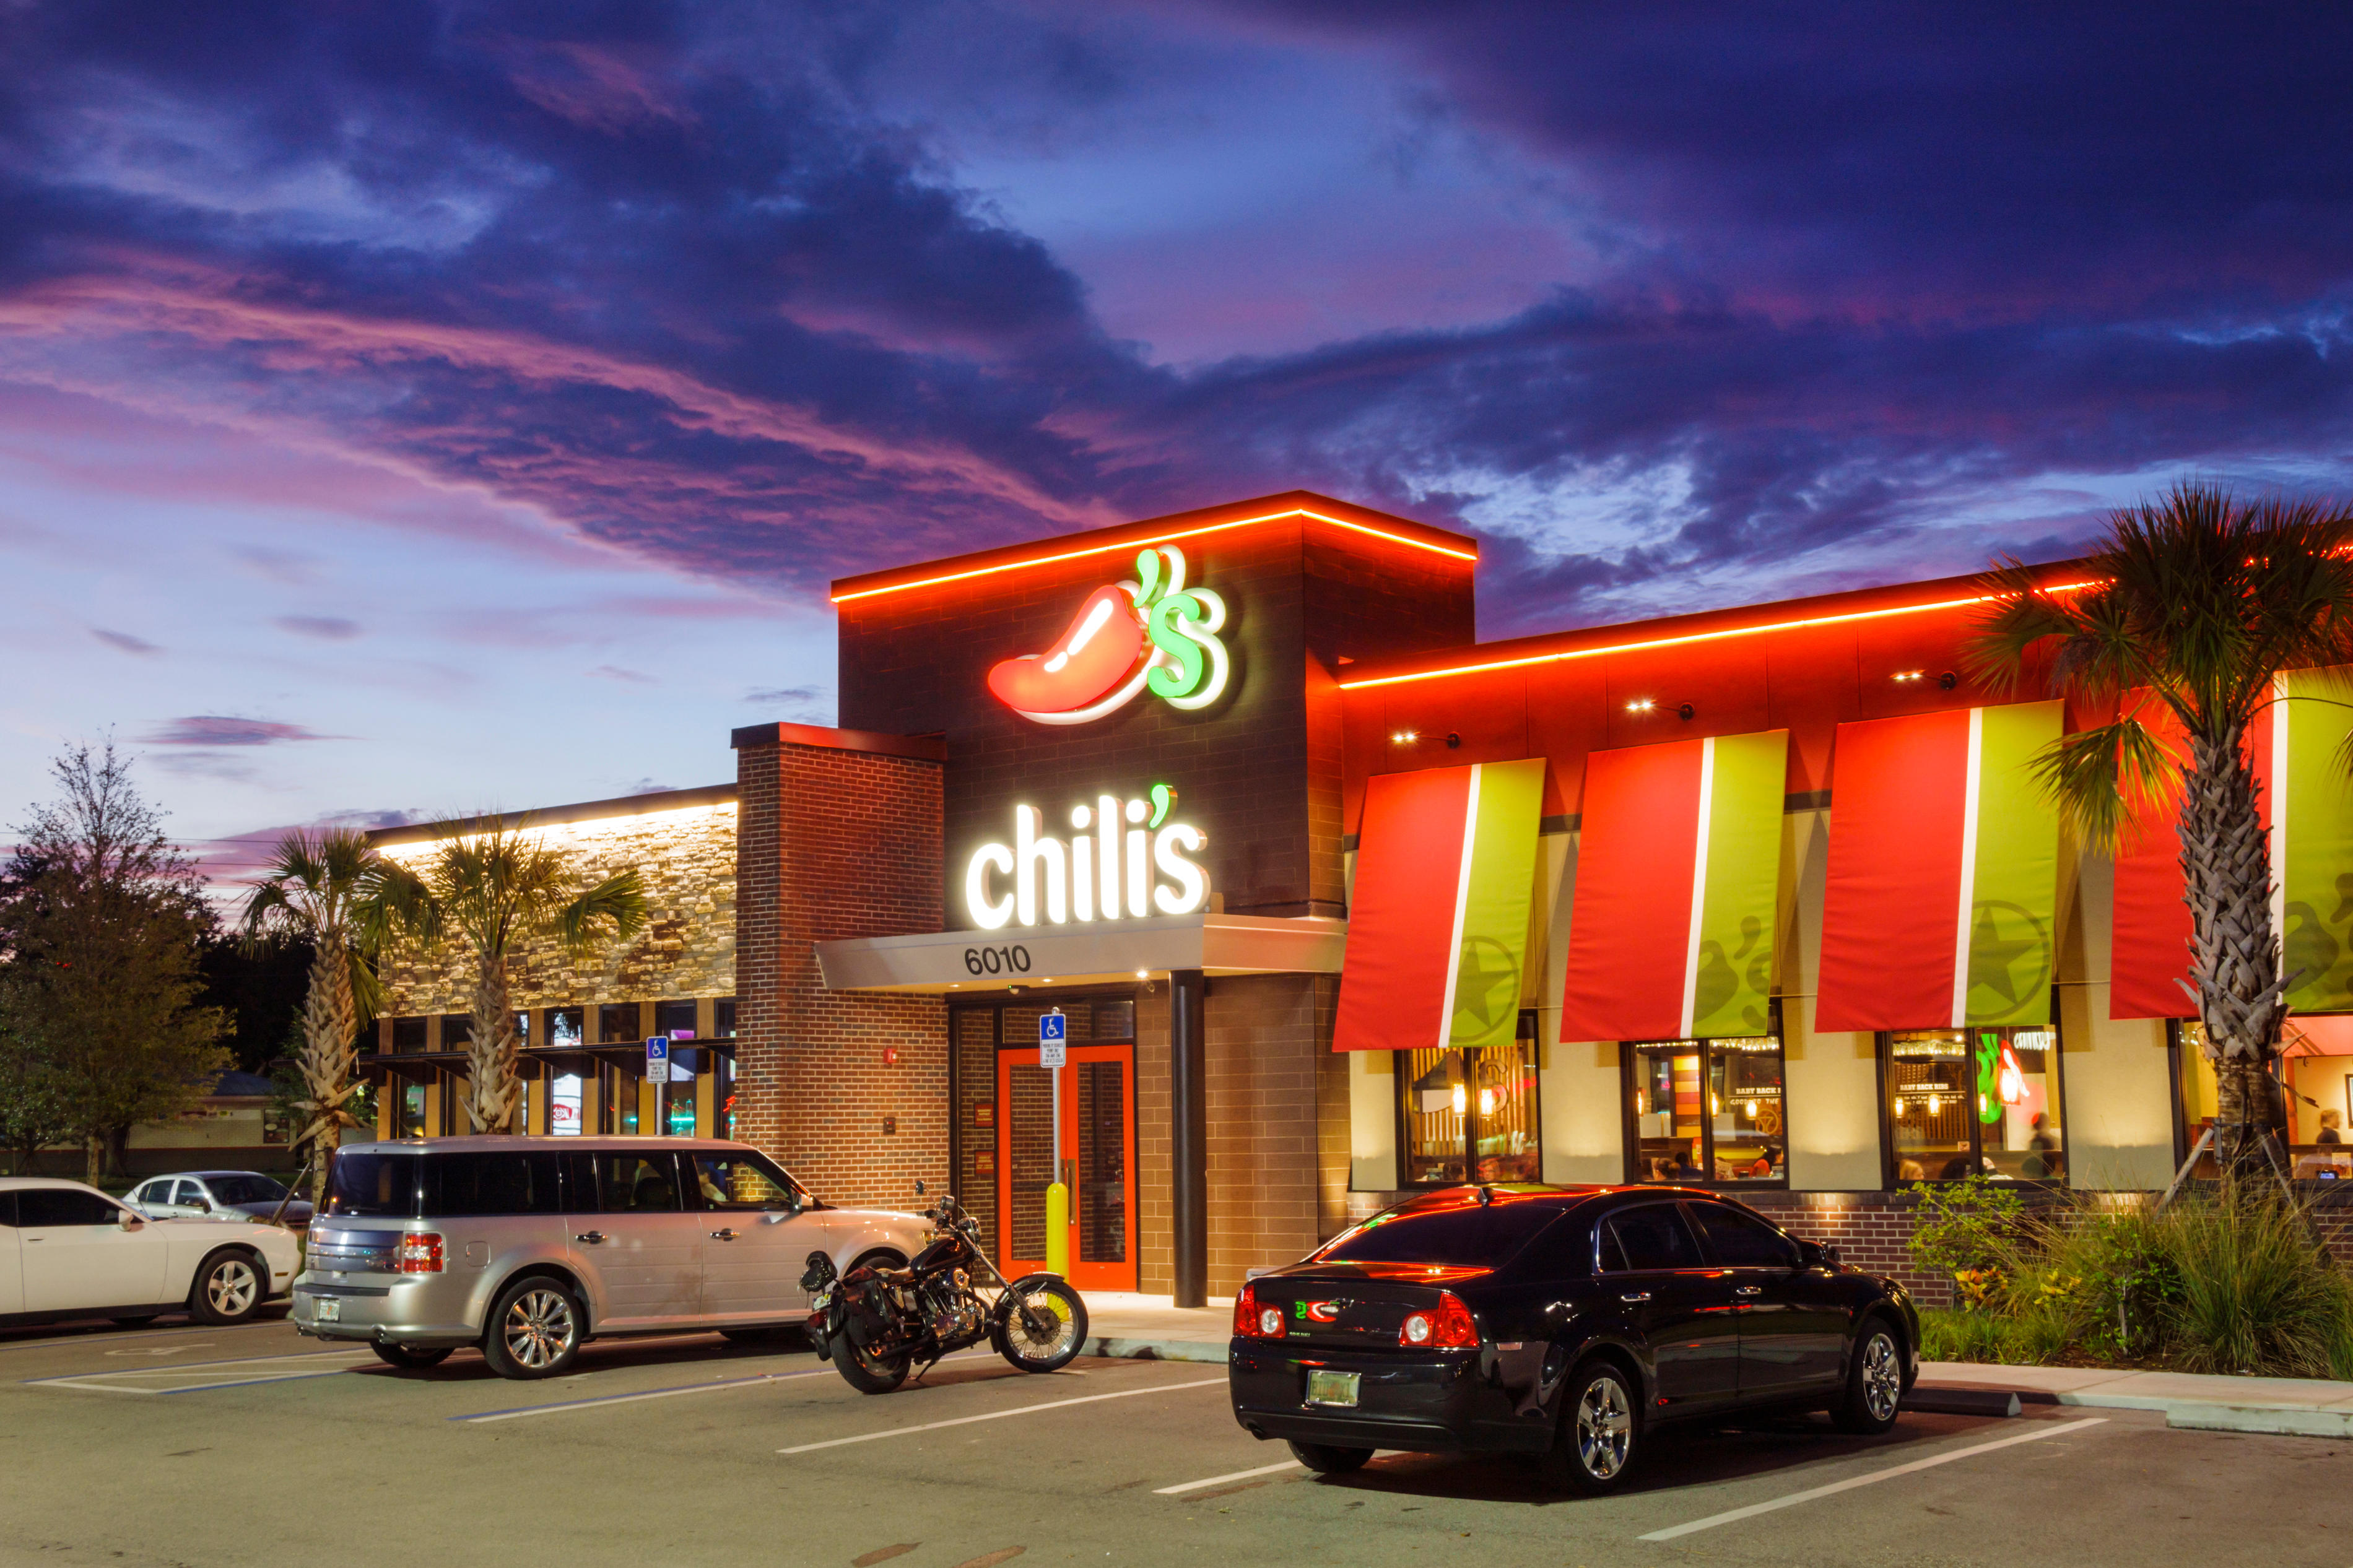 Florida Ellenton Chili's restaurant chain franchise business casual dining building exterior lit sign logo branding parking car dusk neon night